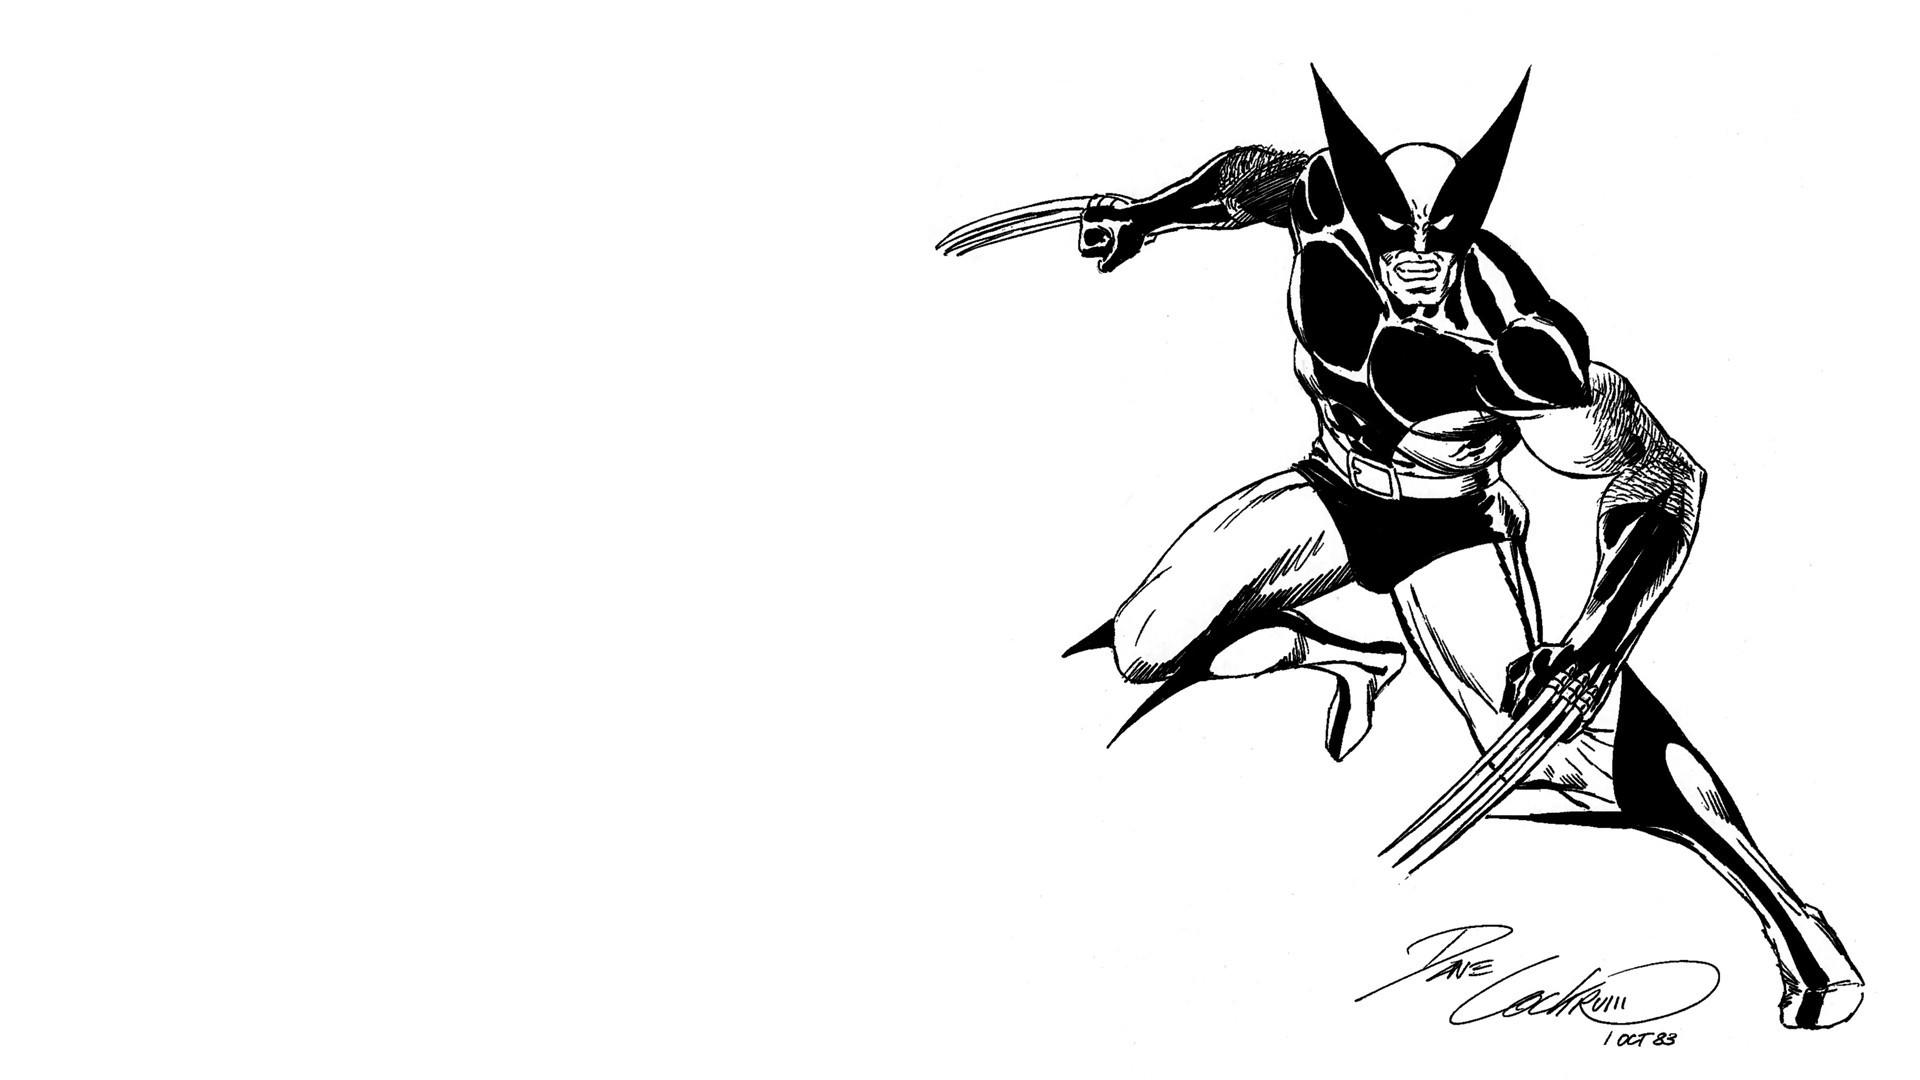 Wolverine Wallpaper marvel Wallpaper Wolverine Pinterest